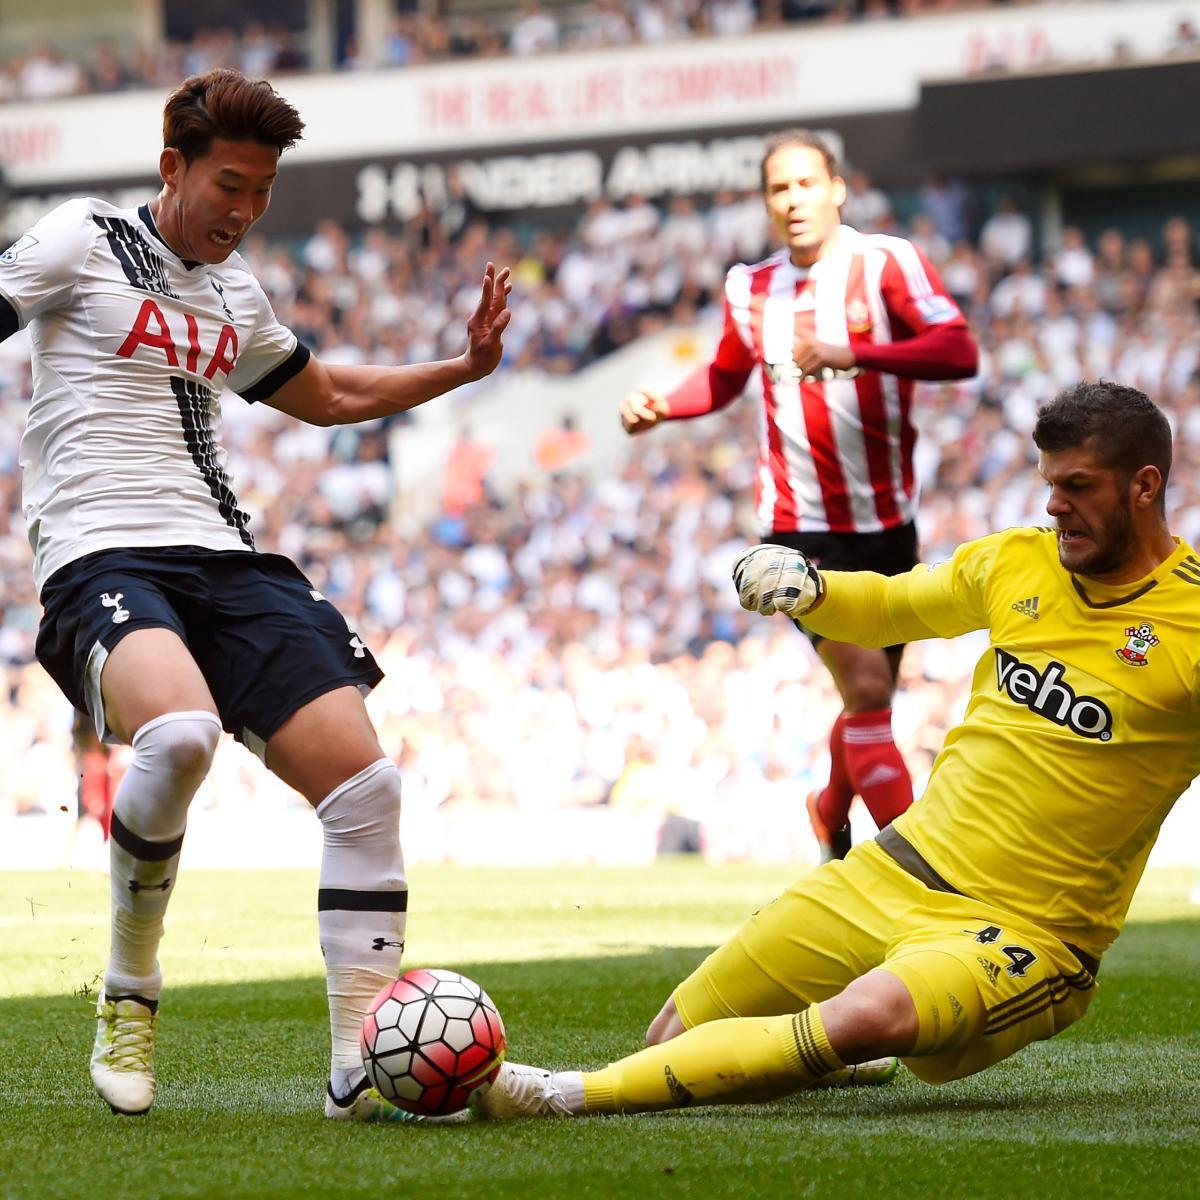 Arsenal Vs Tottenham Live Score Highlights From Premier: Tottenham Vs. Southampton: Live Score, Highlights From